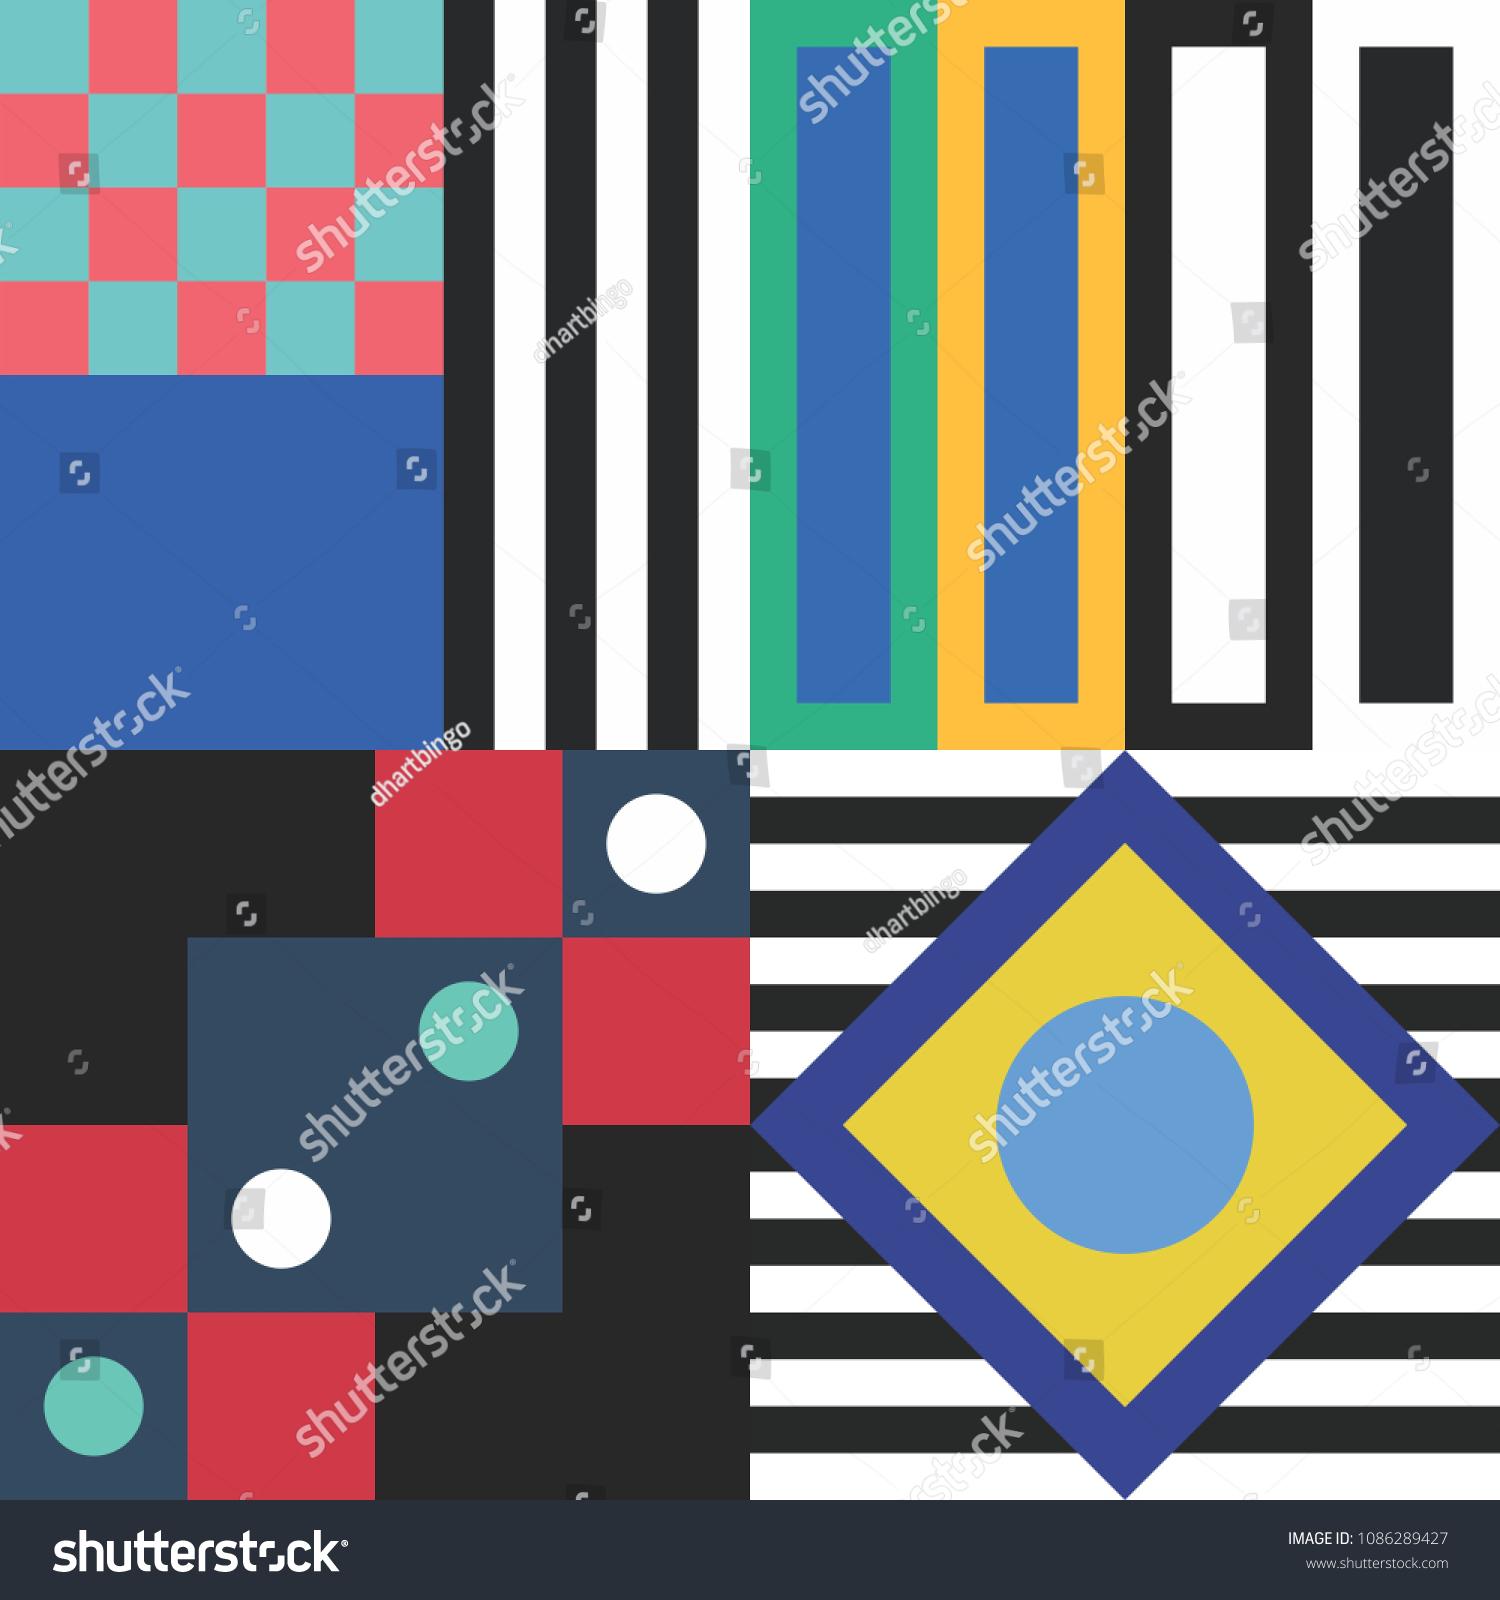 Trendy Geometric Elements Memphis Greeting Cards Design Retro Style Texture